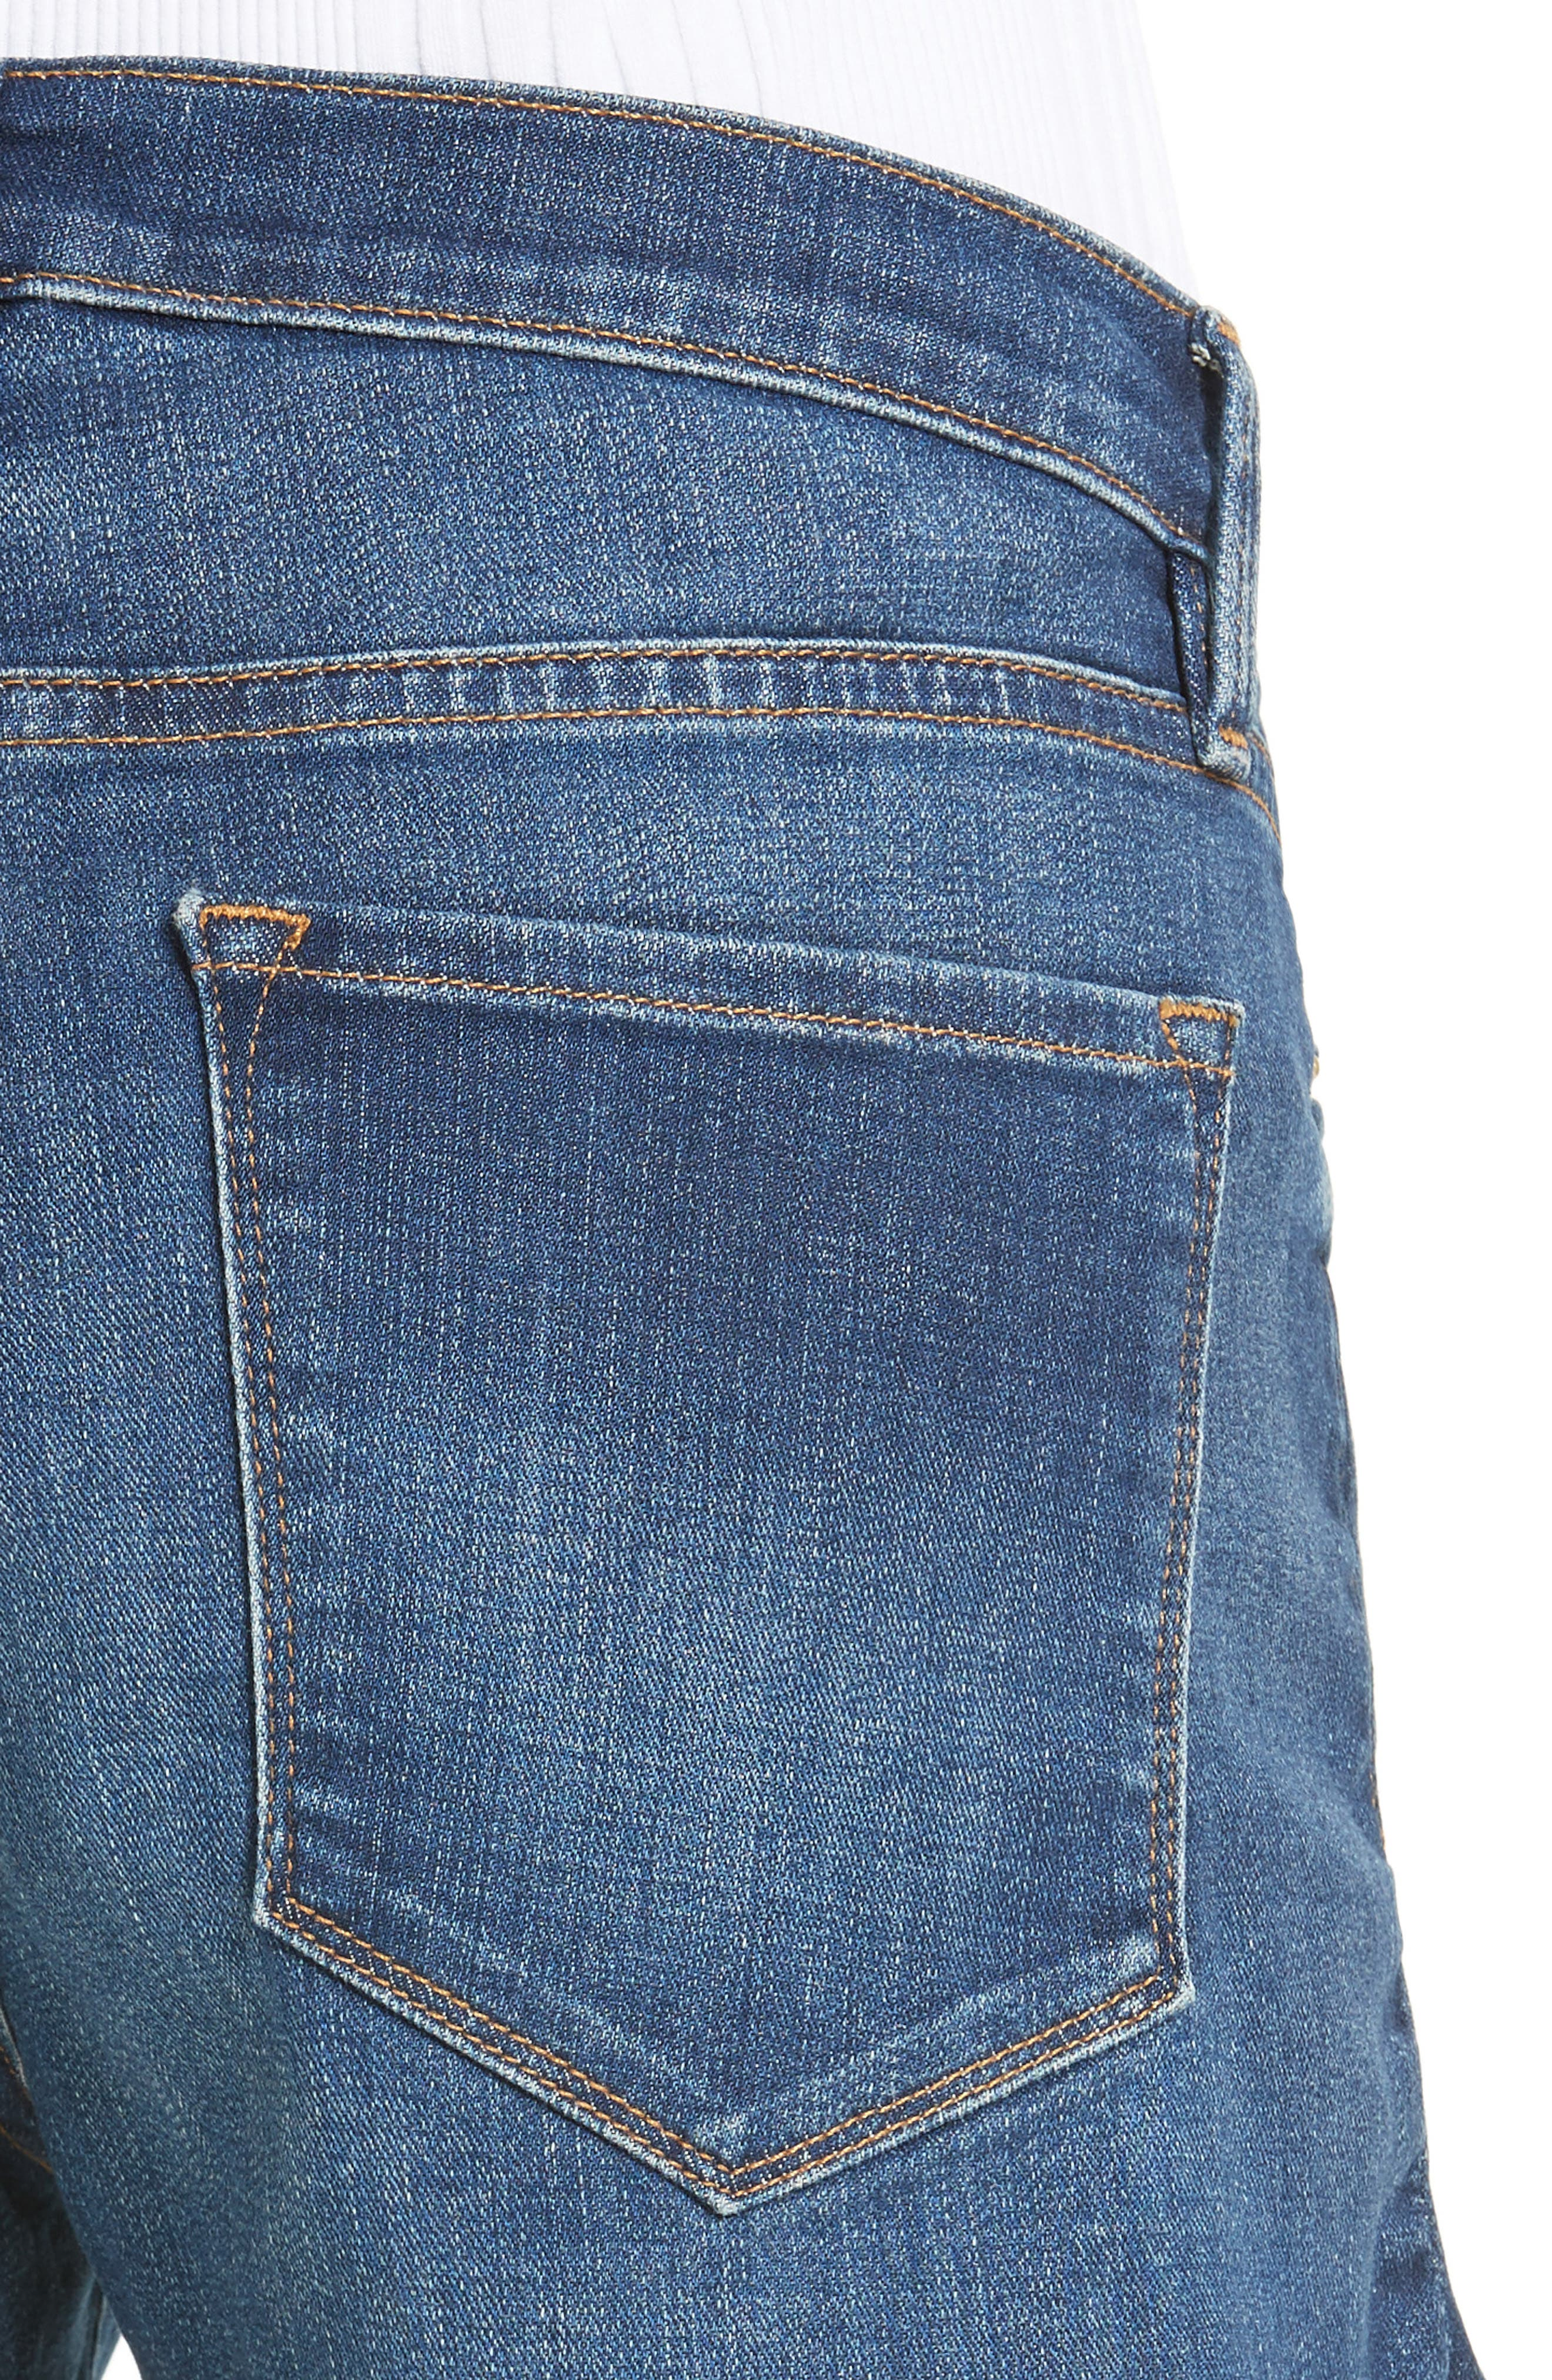 Le Cutoff Denim Shorts,                             Alternate thumbnail 4, color,                             WILLIAMS